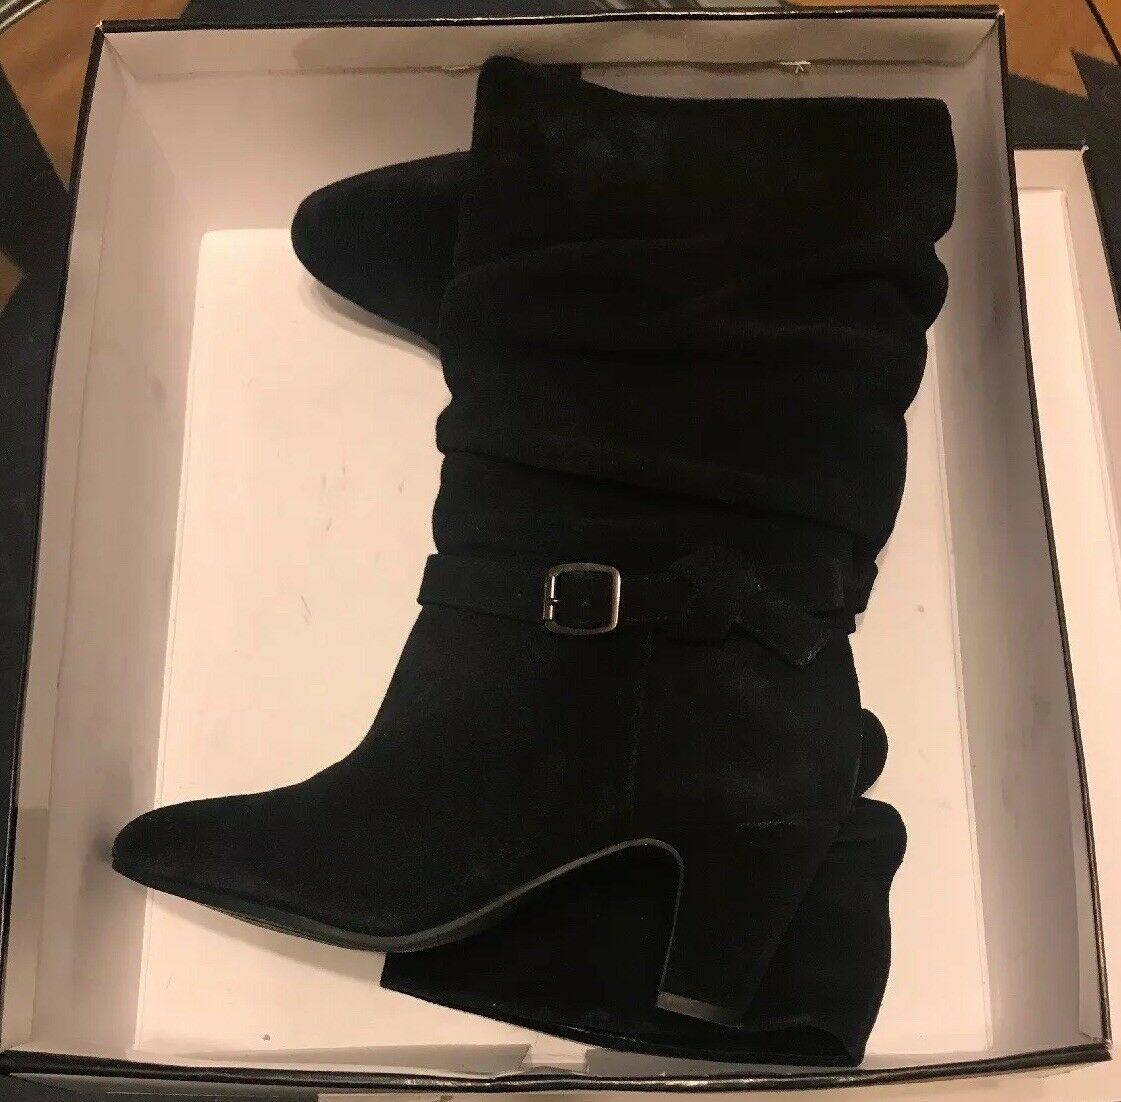 NWT Women Suede Leather Alex Marie Yarra Yarra Yarra Boots Size 8m  Black e4d0c8